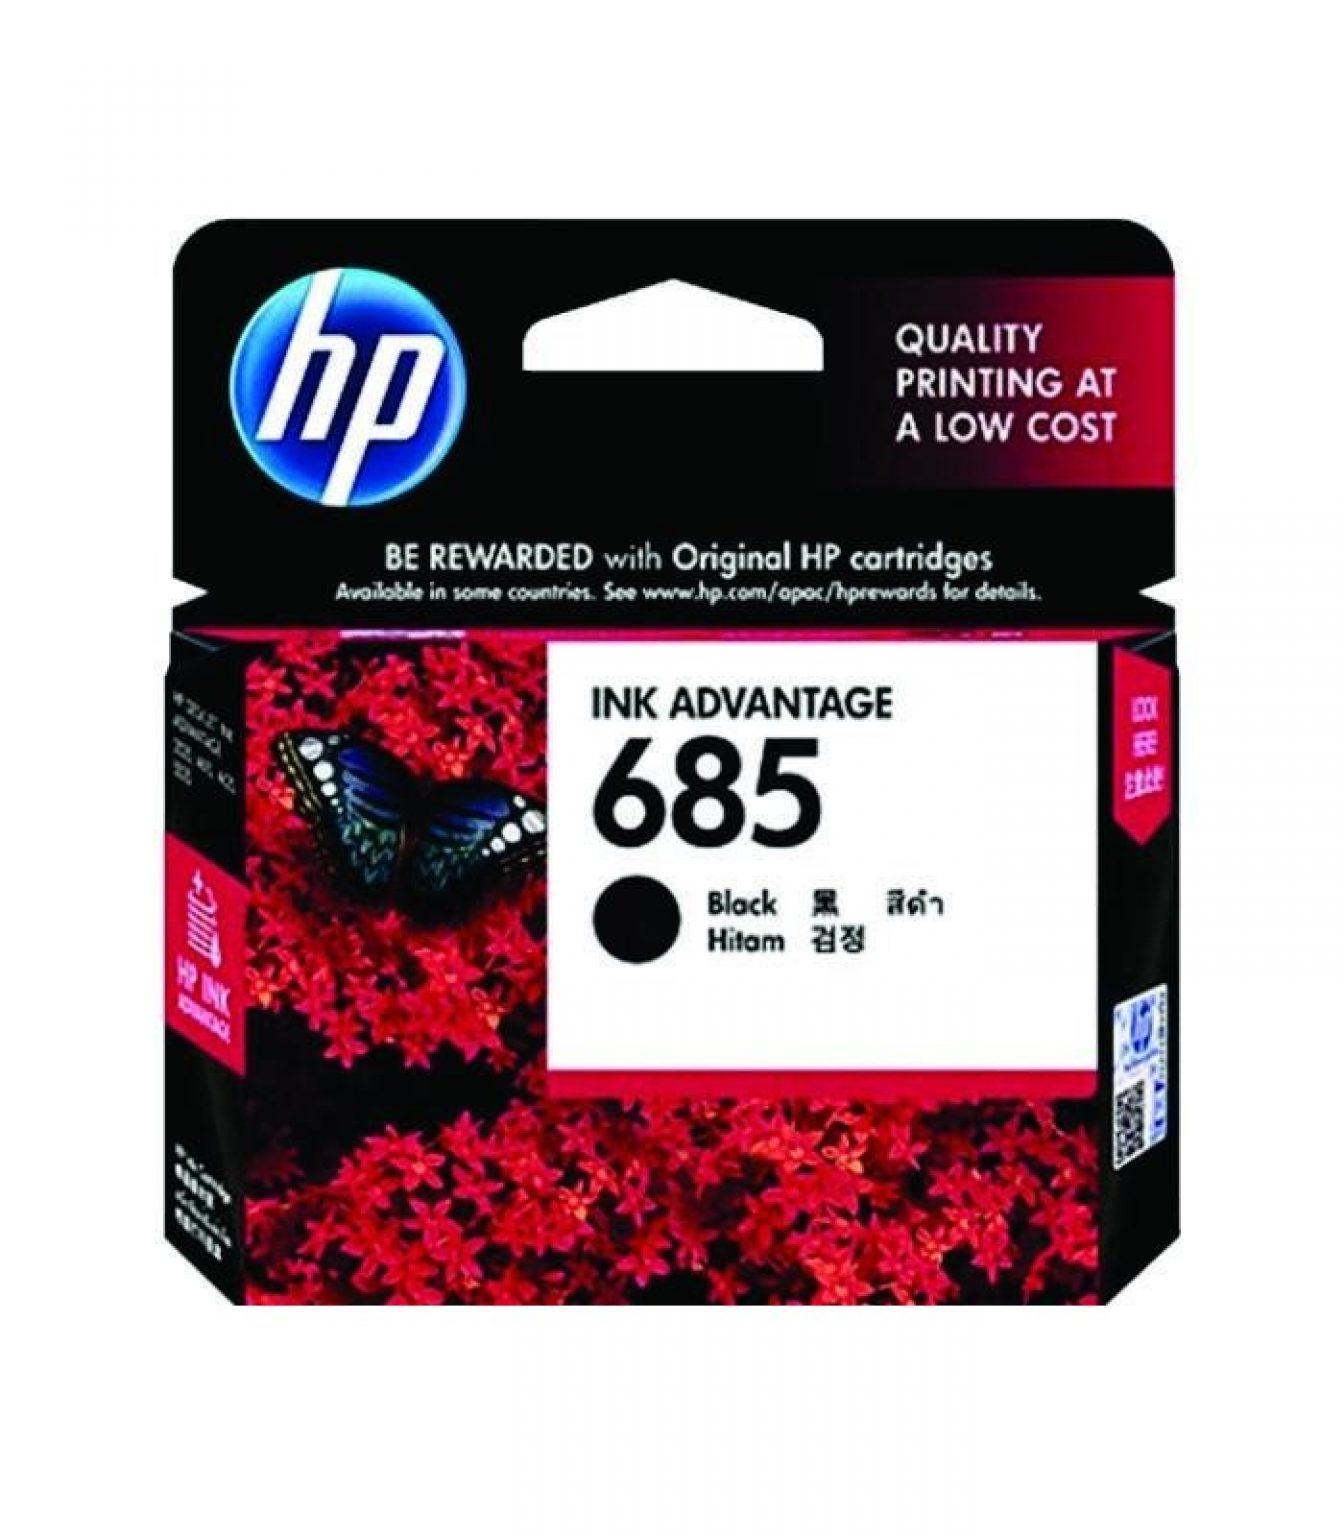 HP - 685 Black Ink Cartridge [CZ121AA]